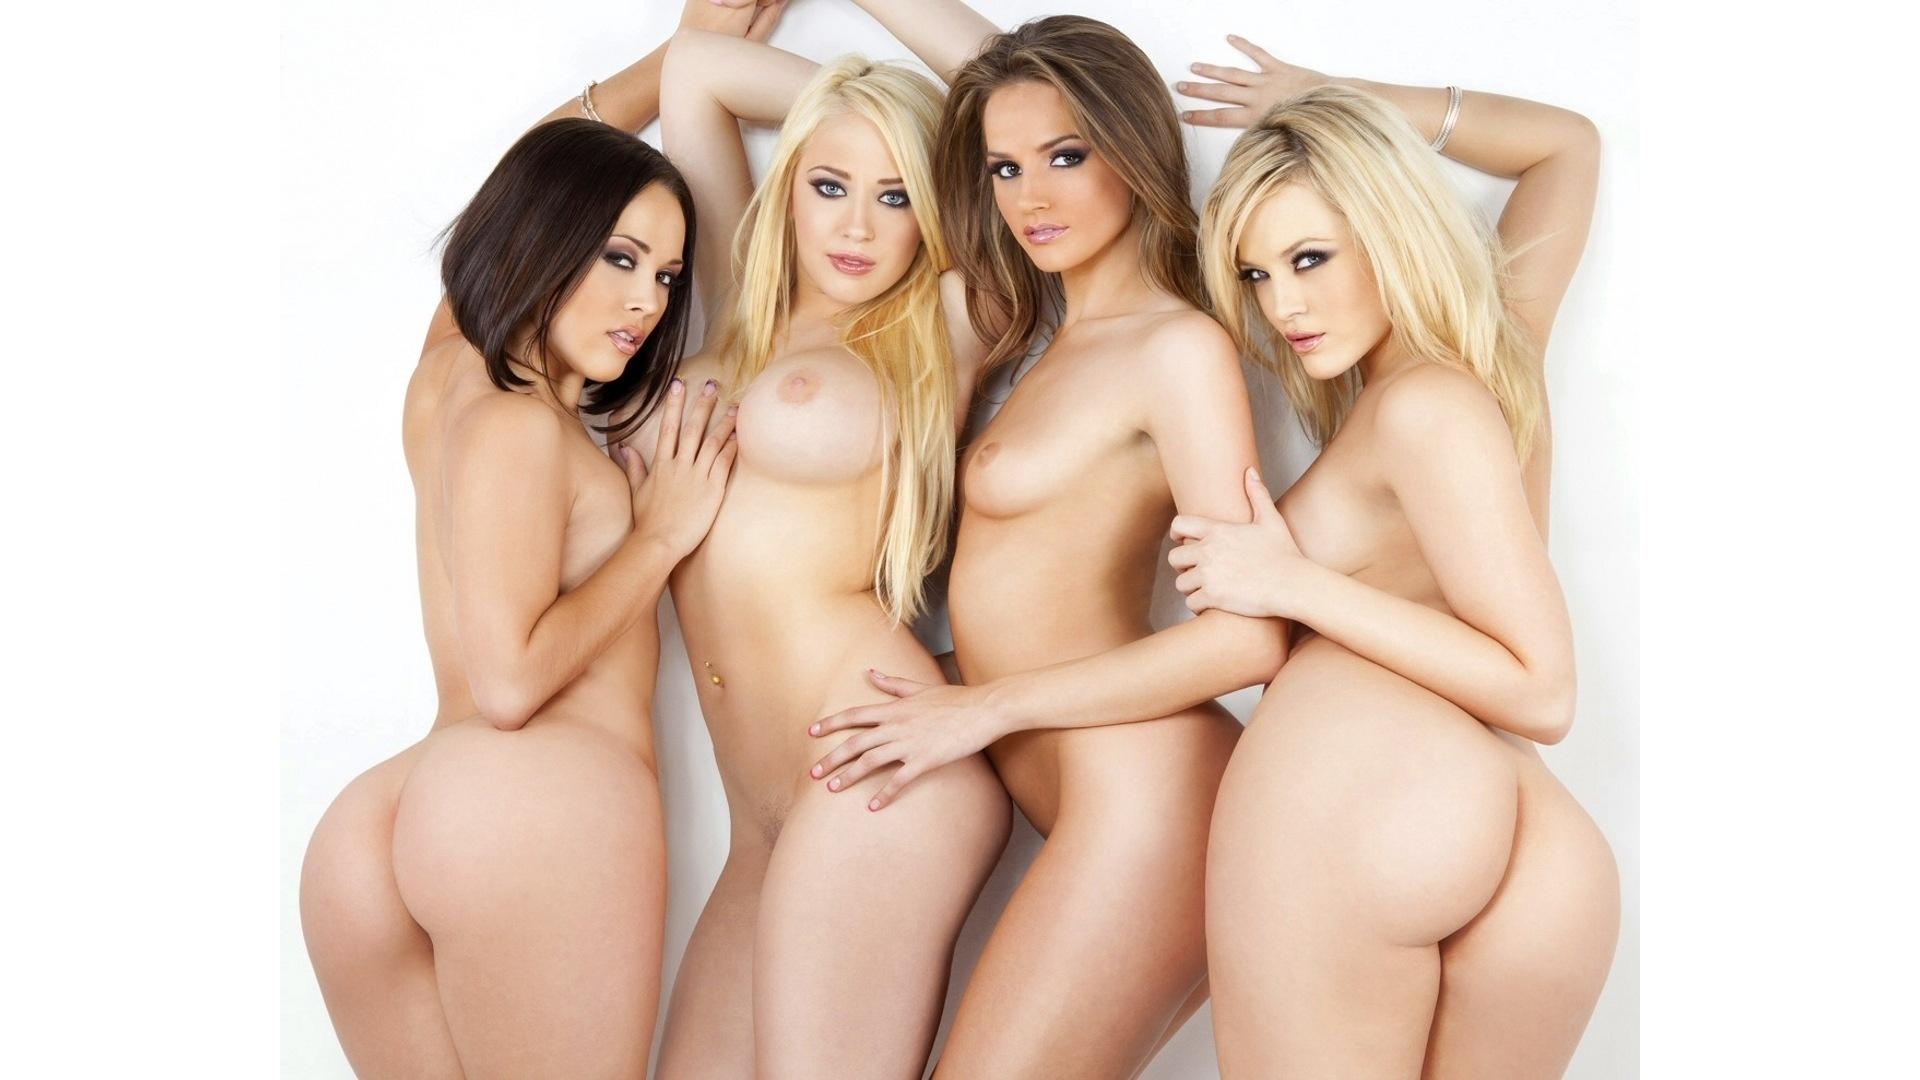 Free downloads of man sucking breasts pron women